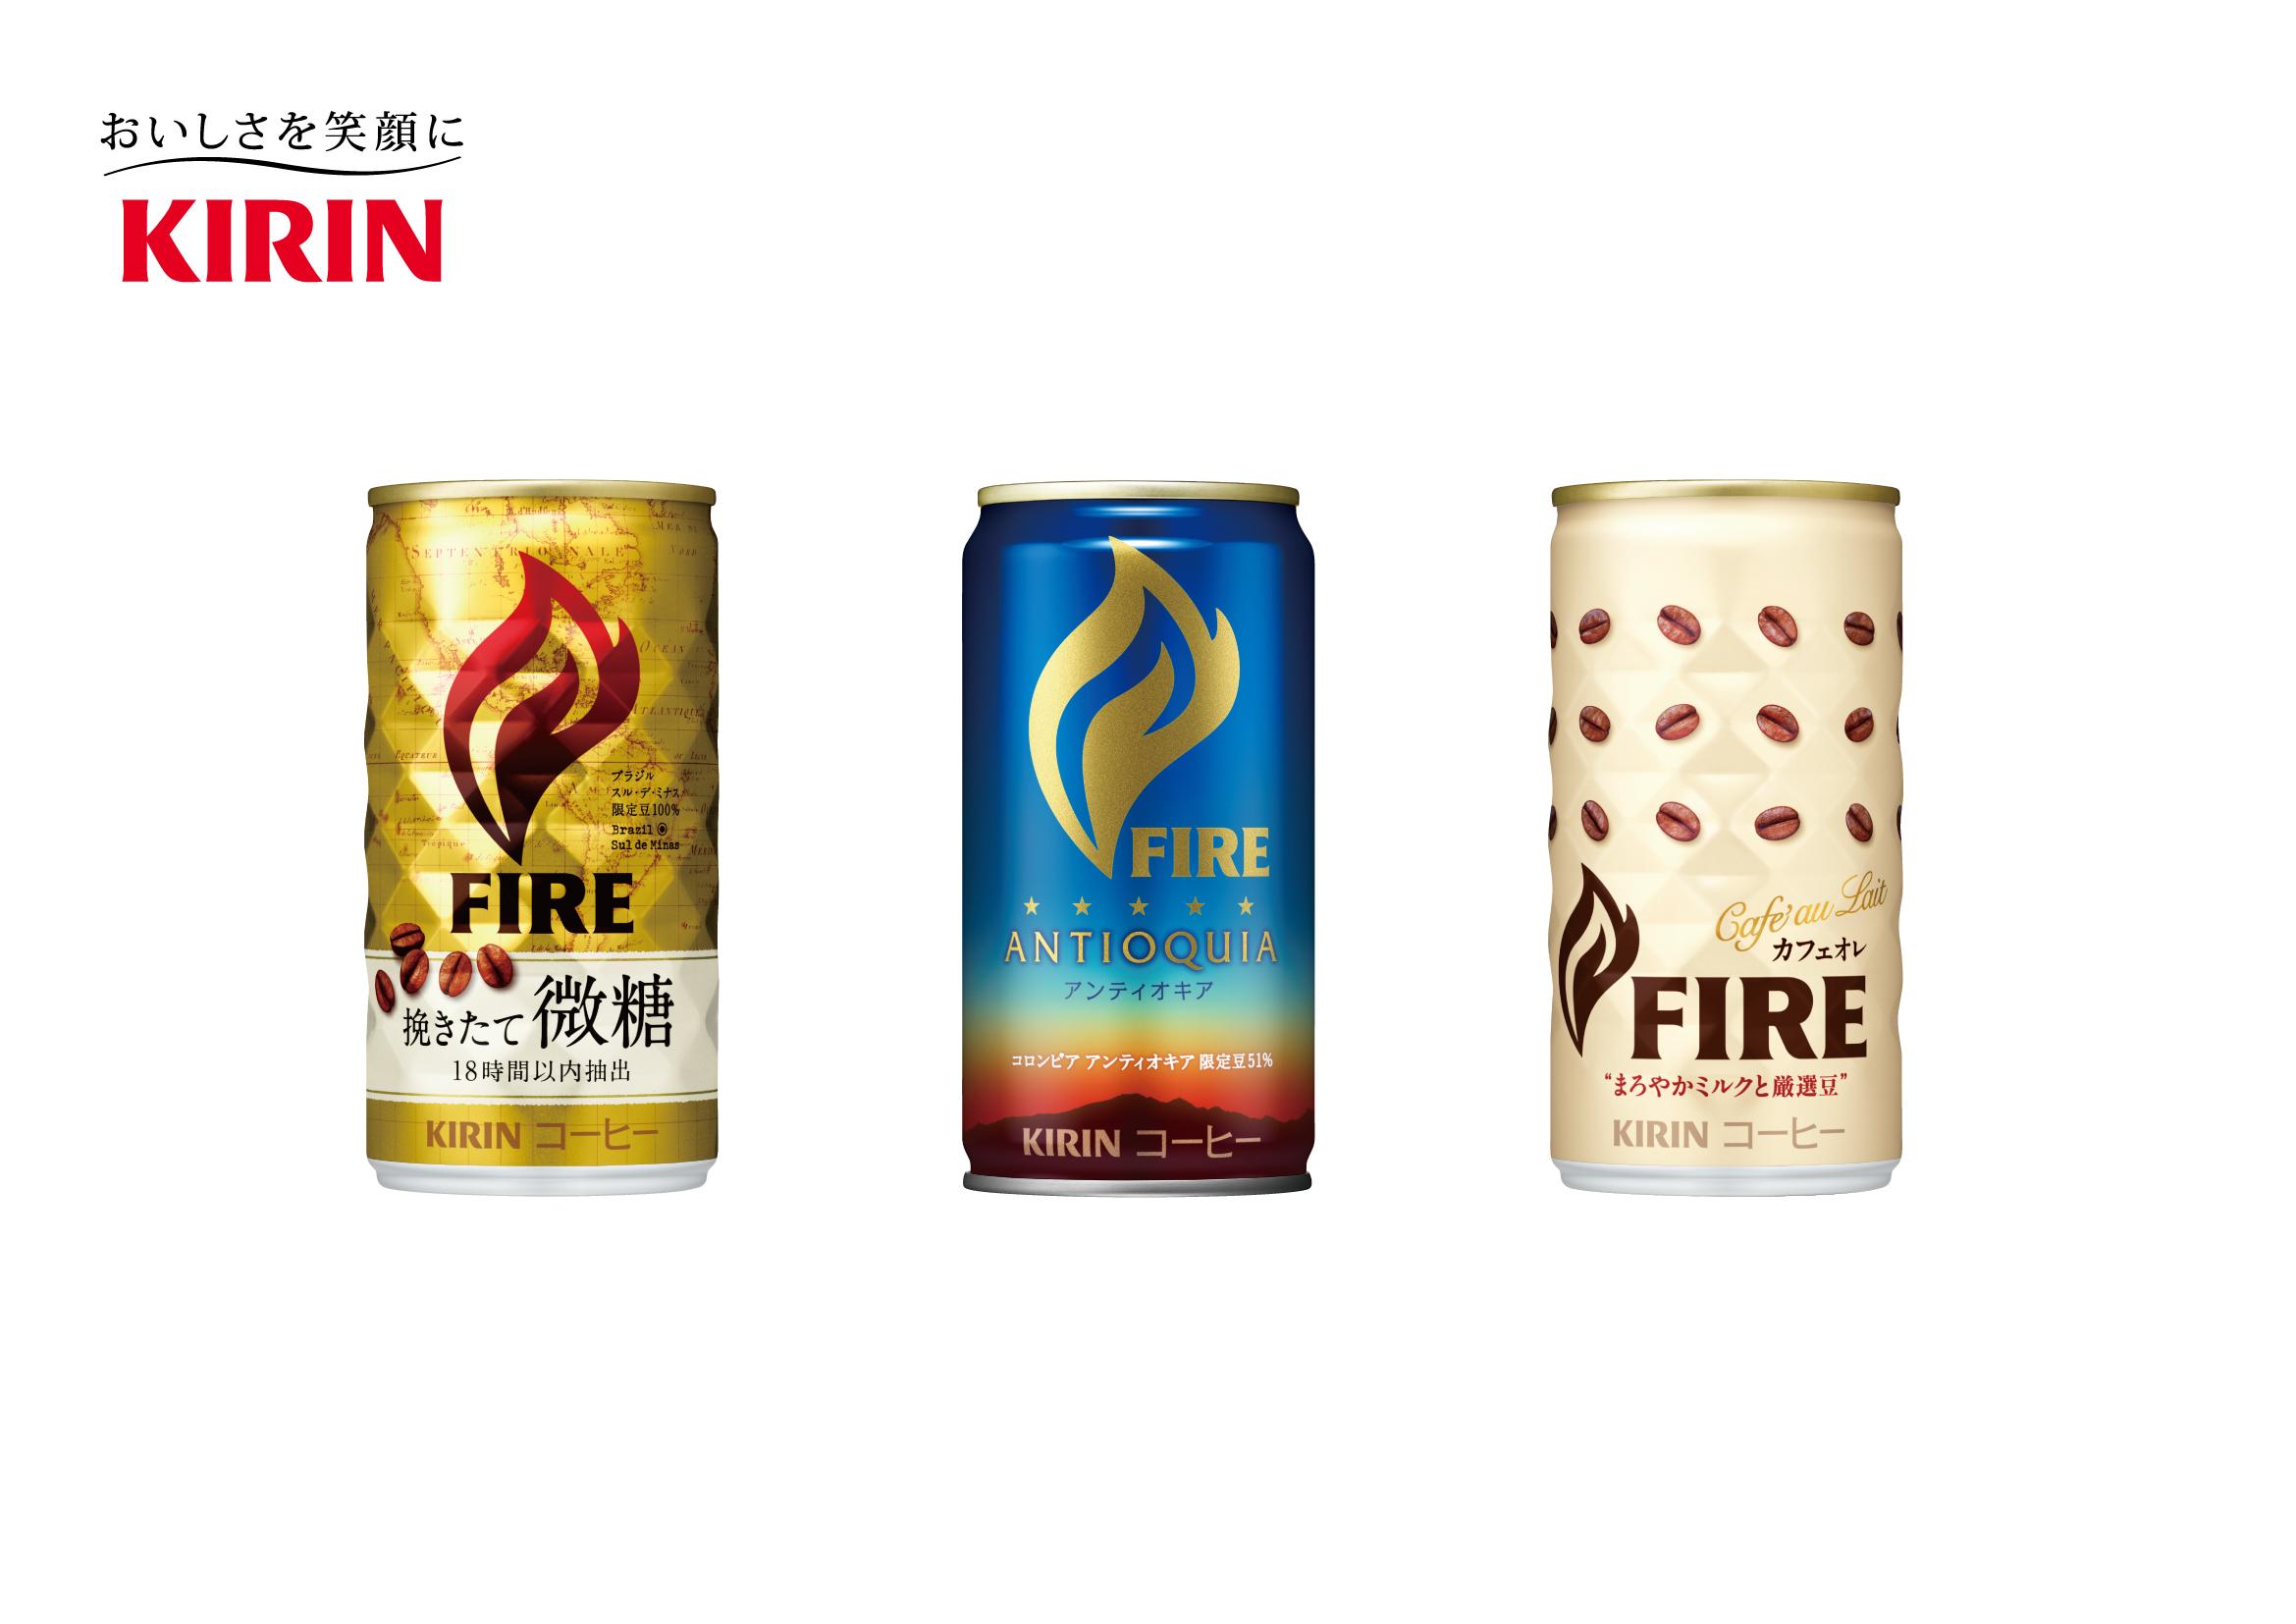 KIRIN FIRE-CAN-1